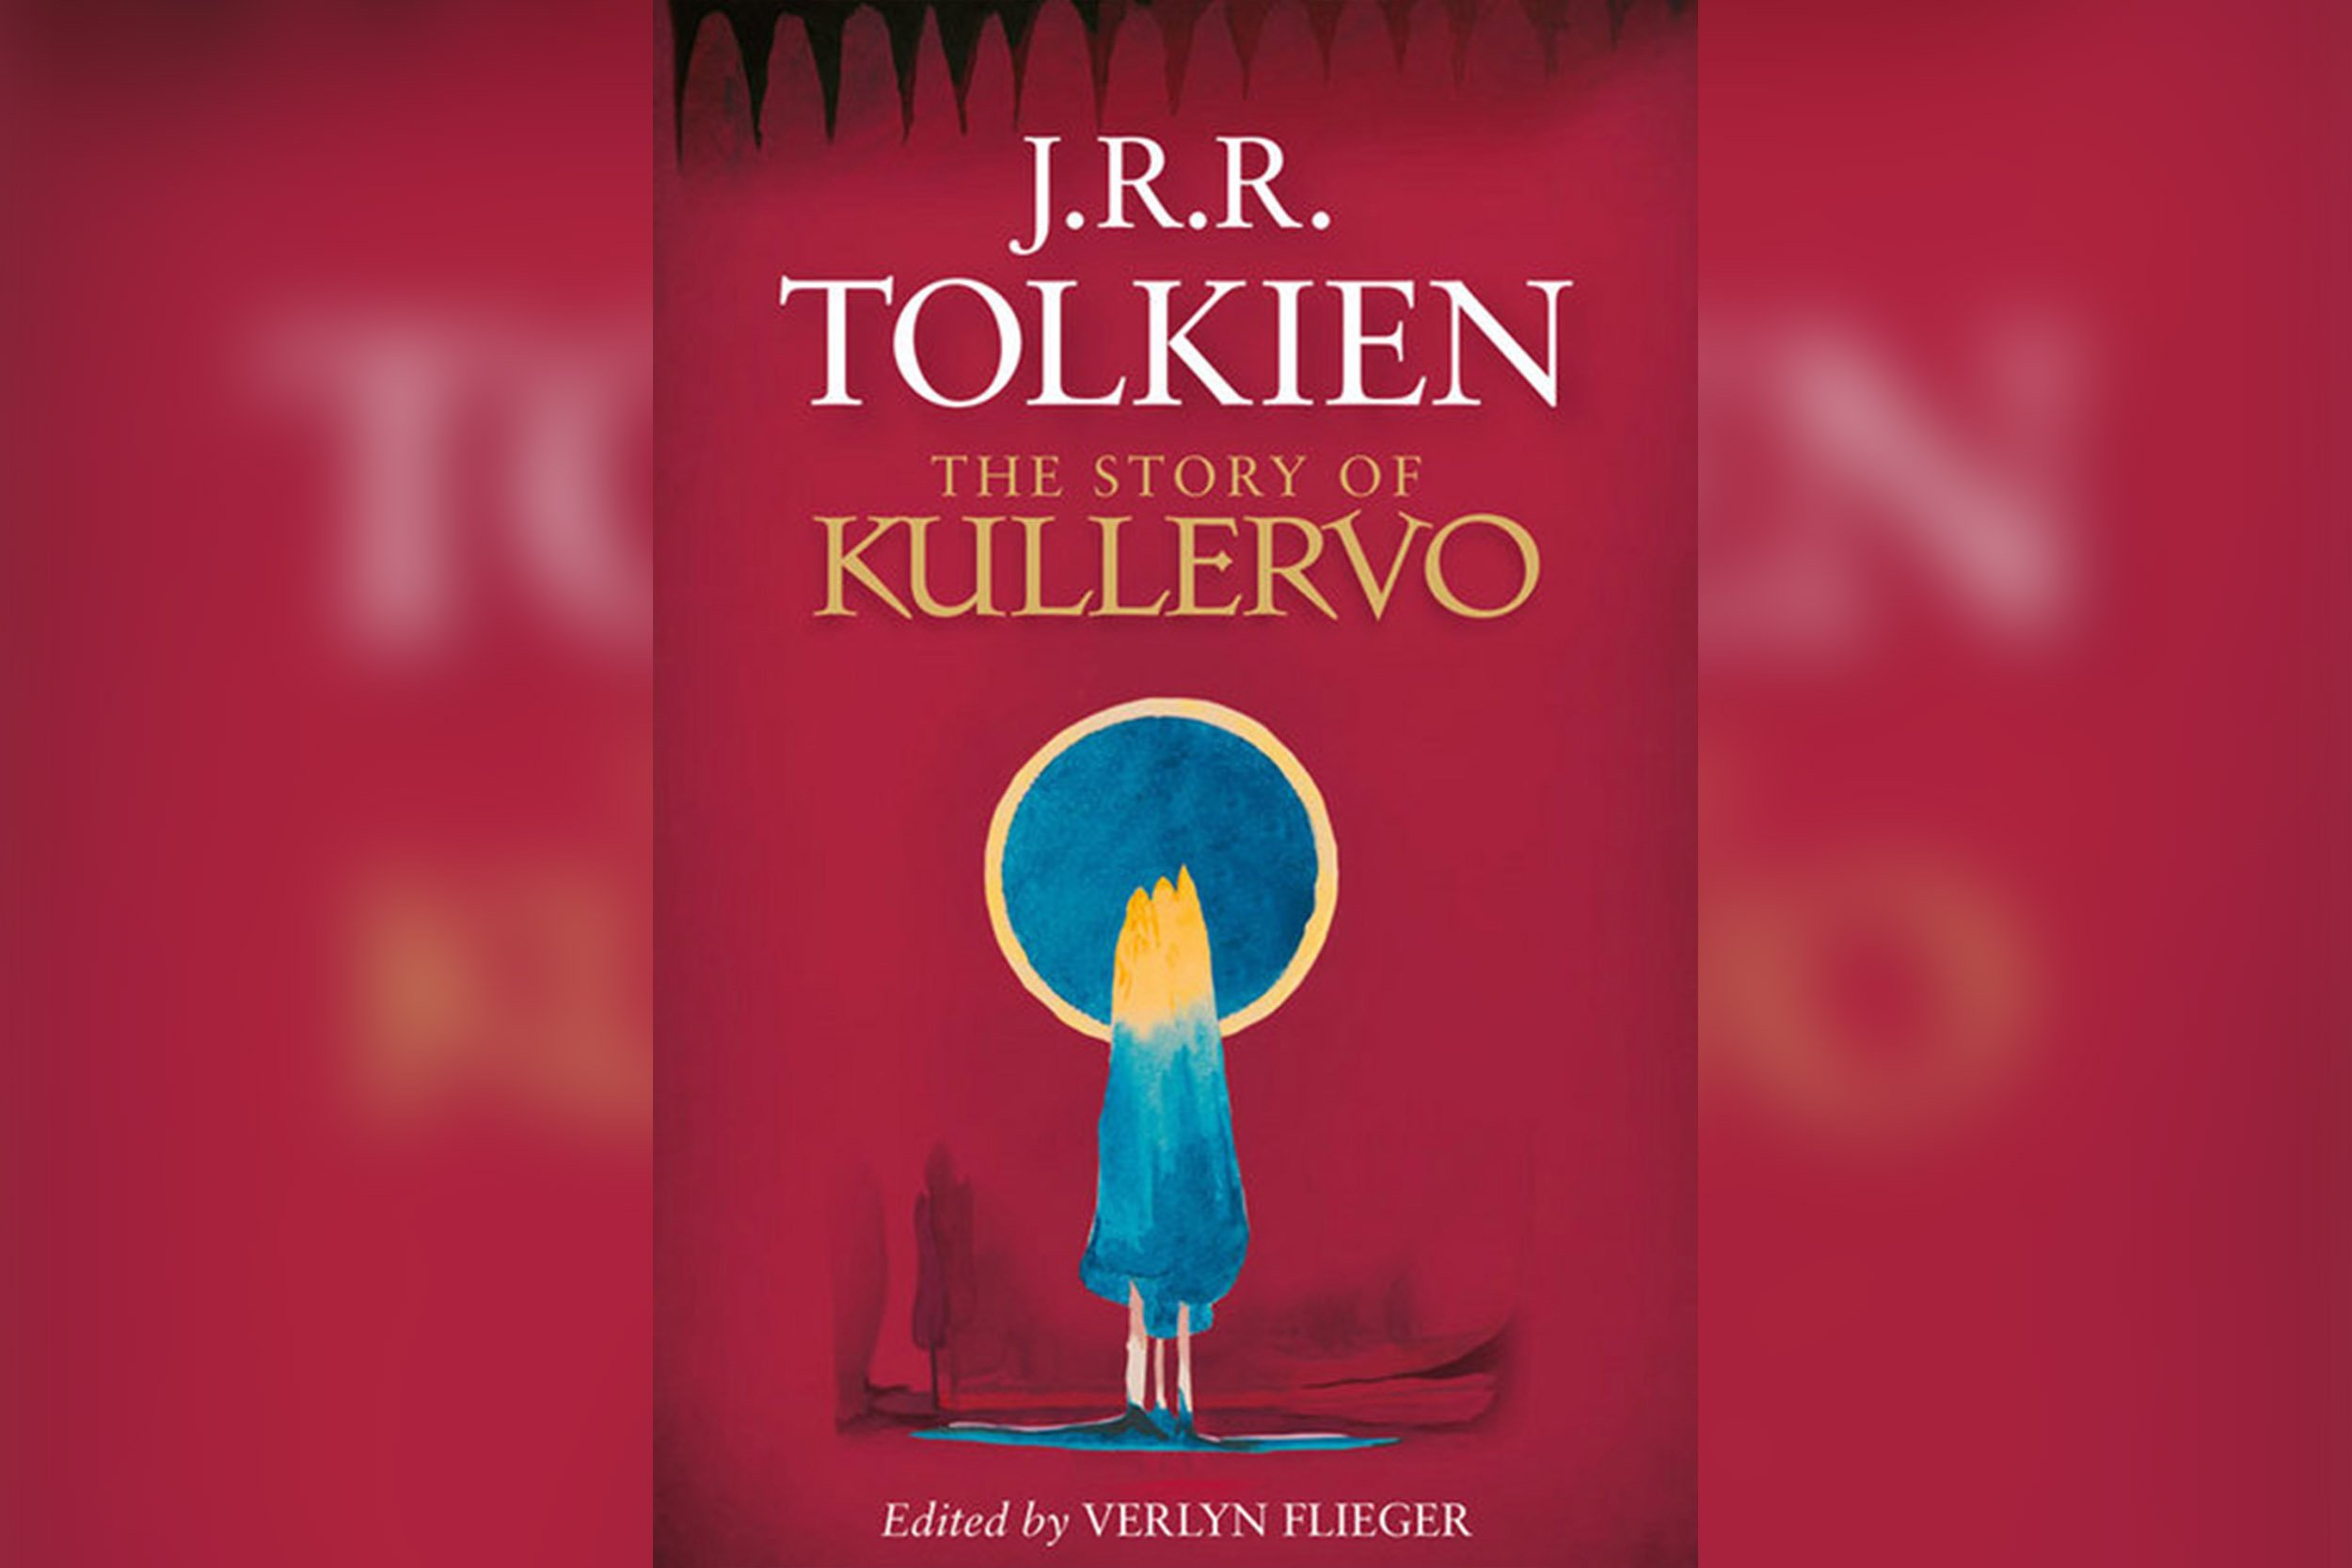 08_12_TolkienKullervo_01